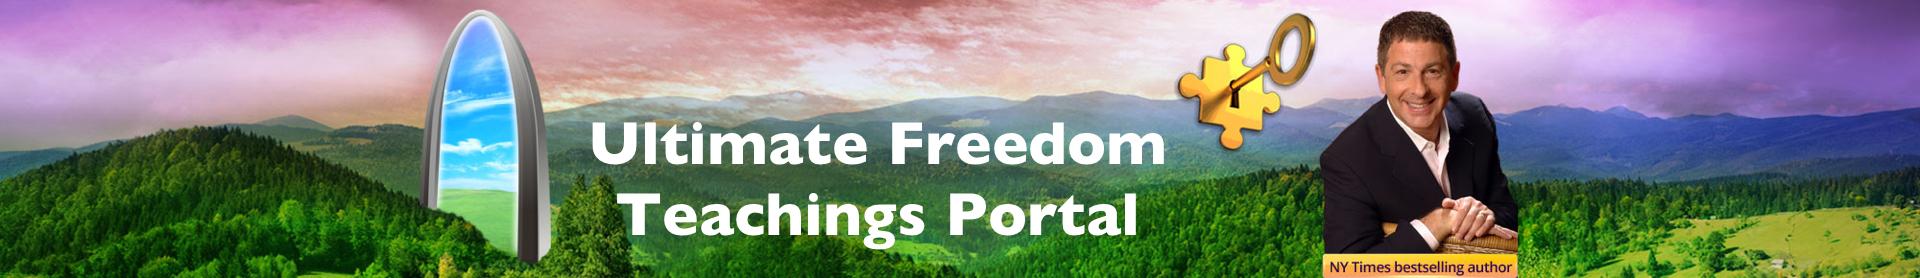 The Ultimate Freedom Teachings Portal